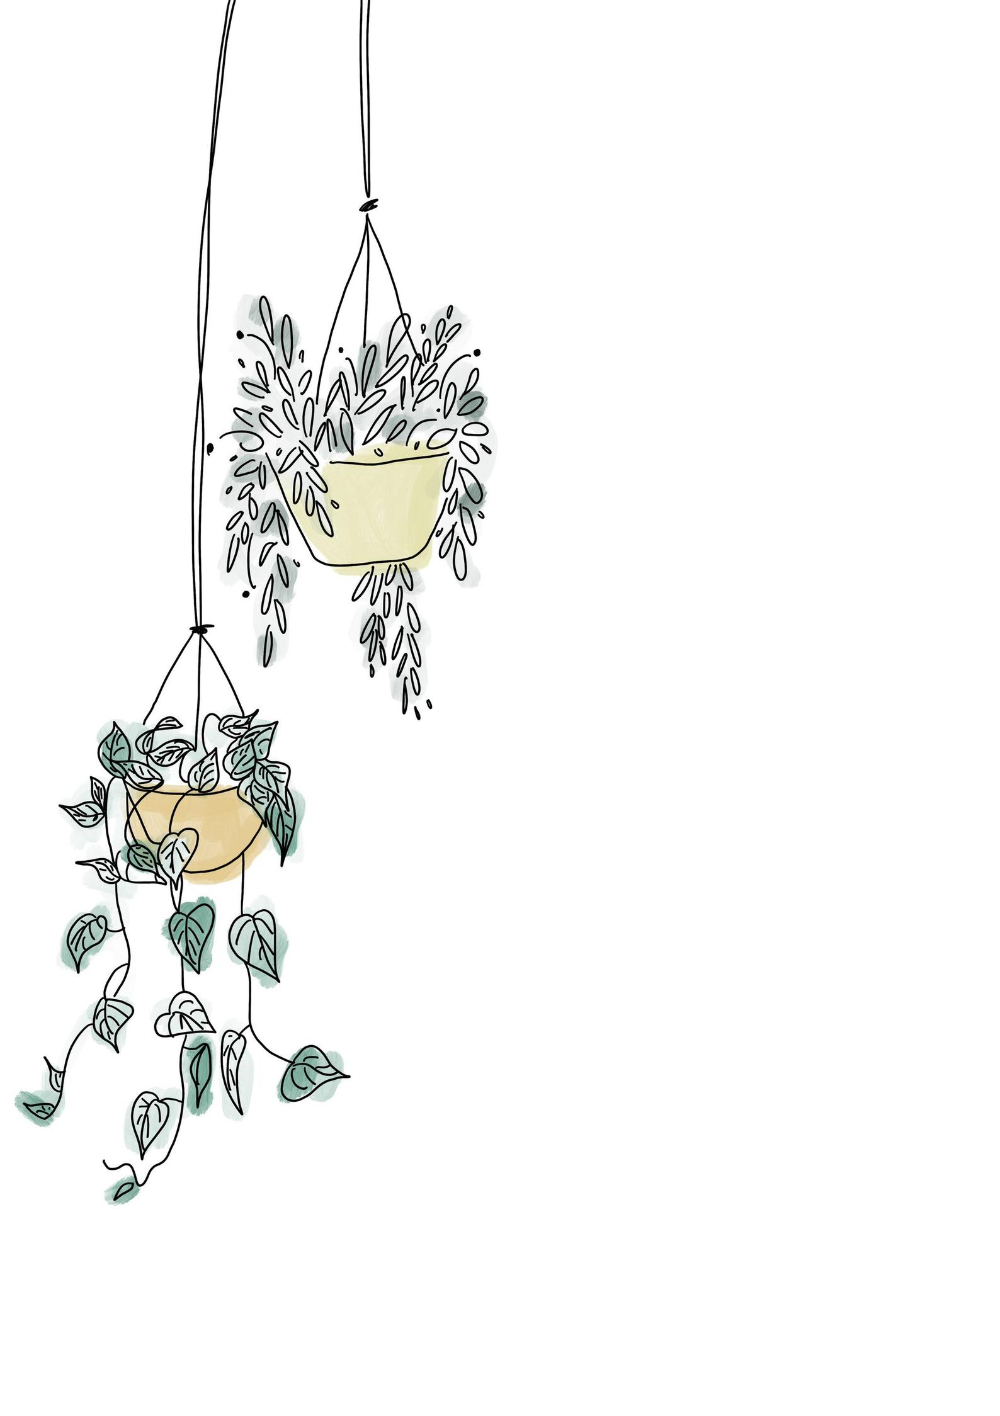 Hanging Plants Digital Print Plant Drawing Line Art Drawings Plant Art